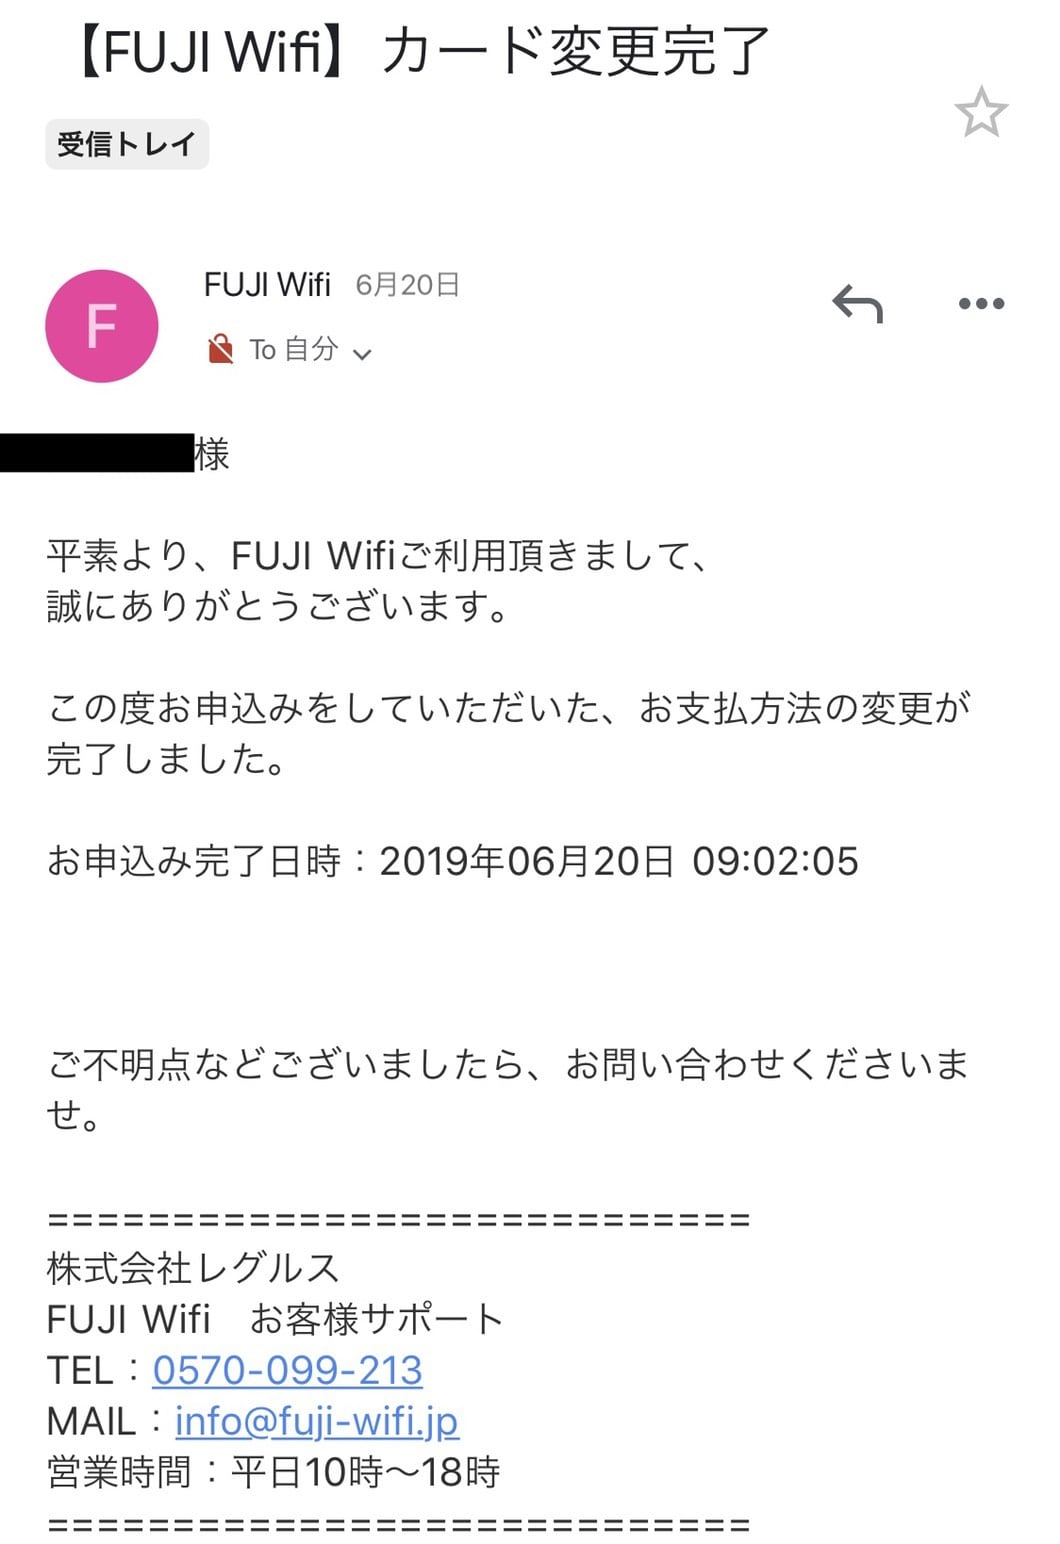 FUJIwifi申し込み完了メール